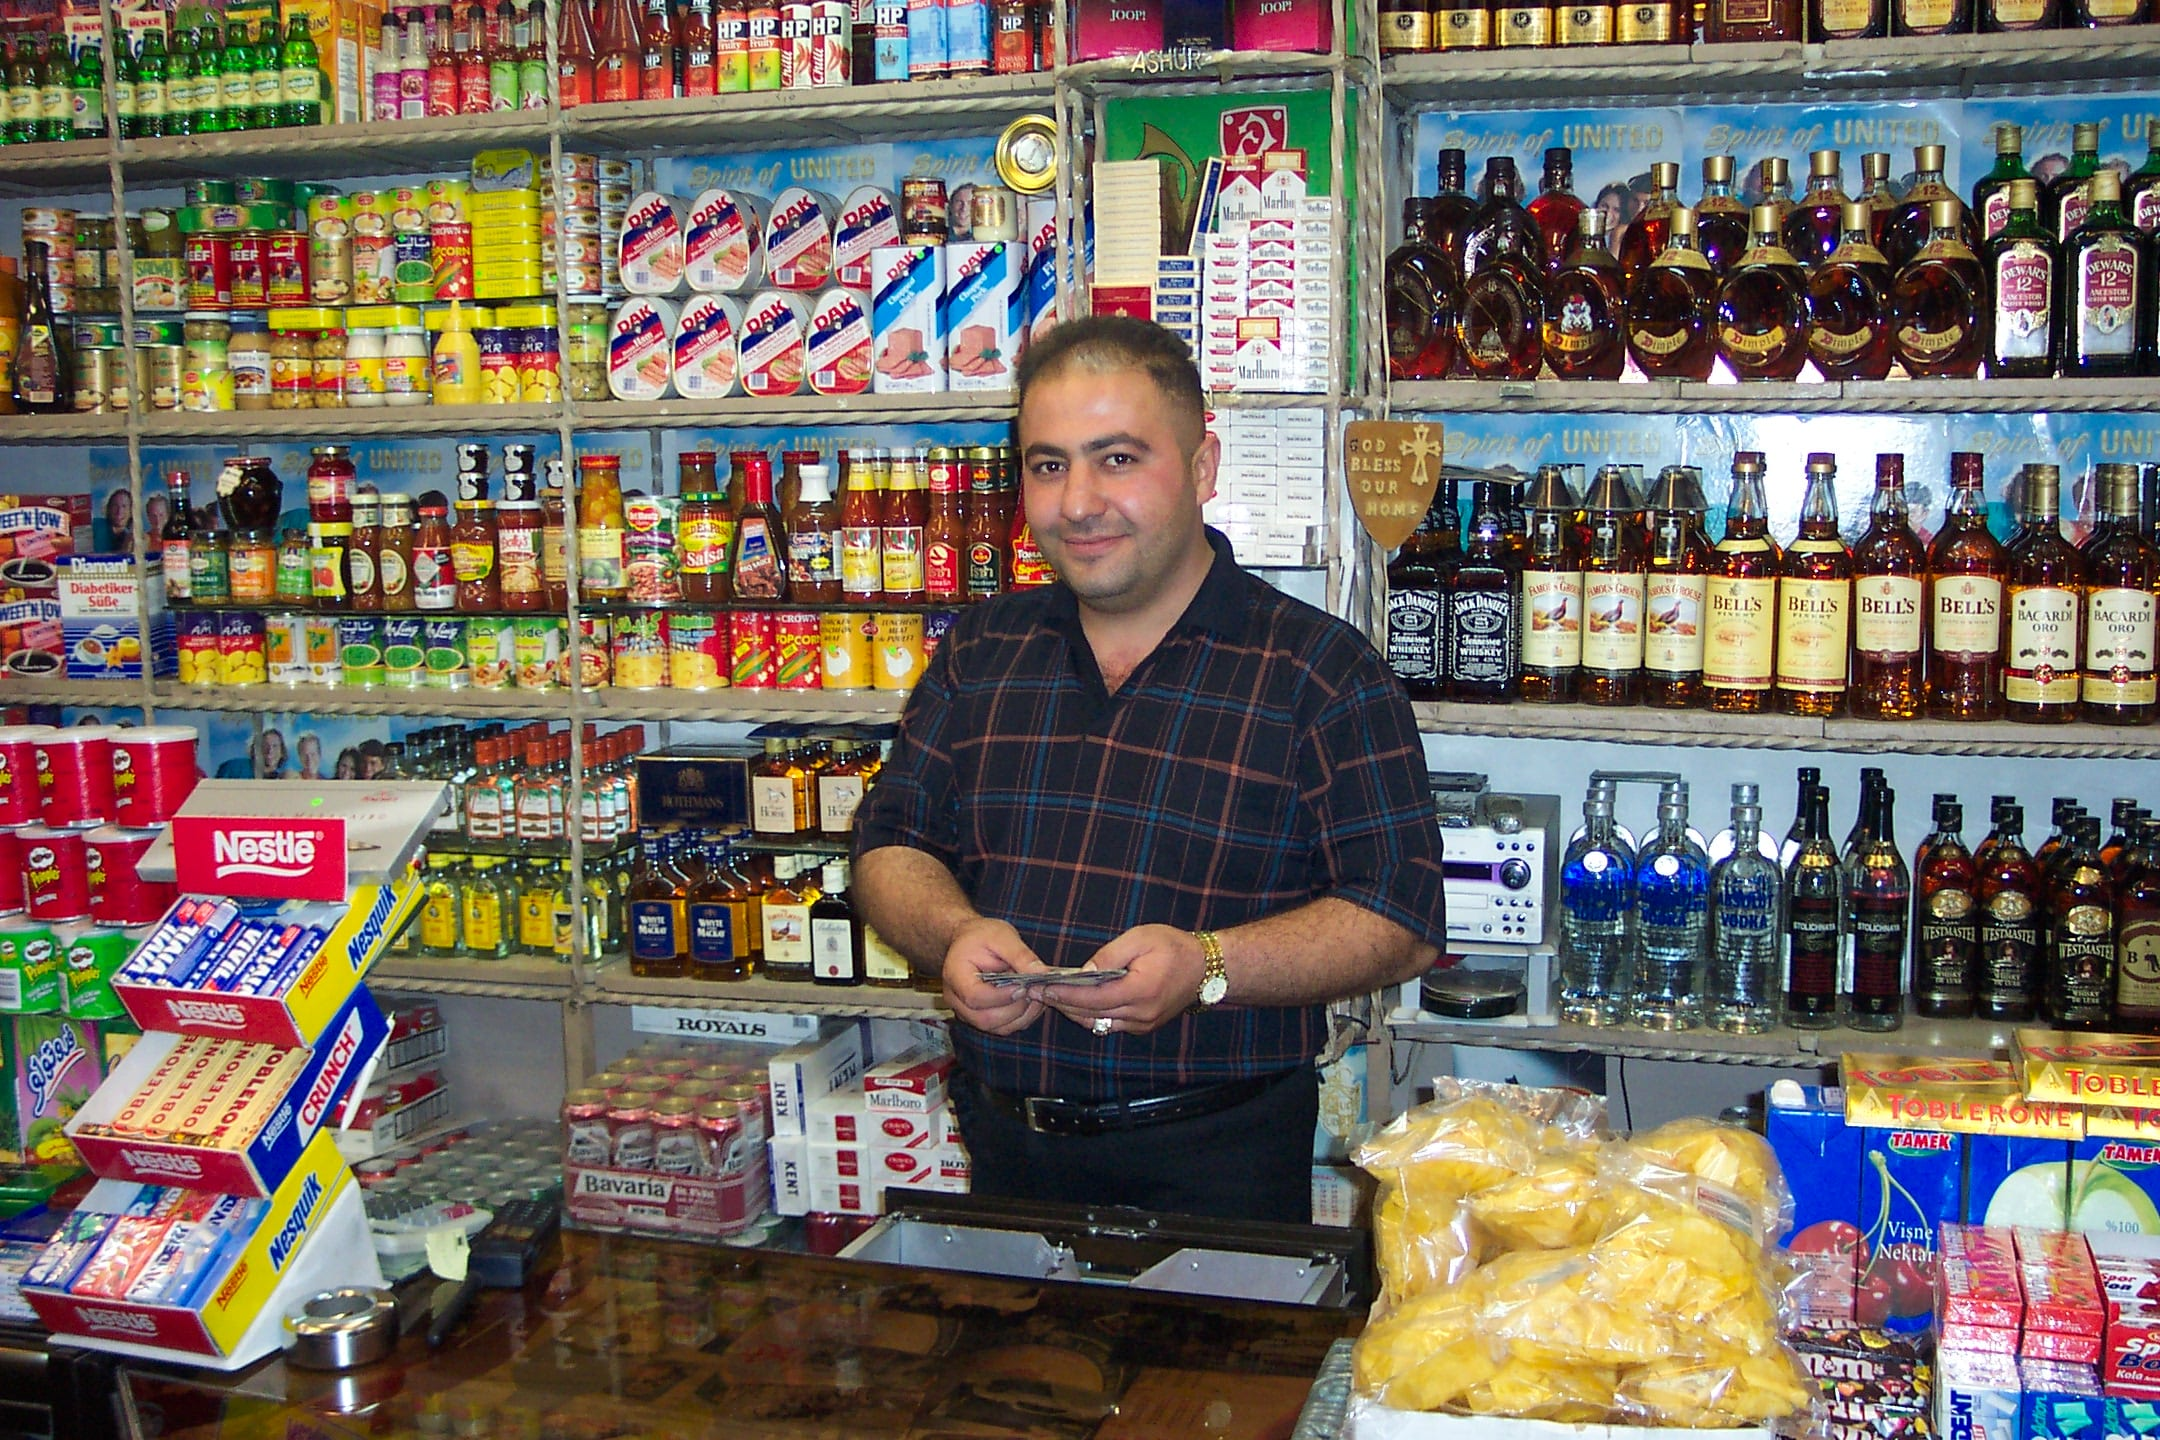 Image A liquor store in Suleimaniya, Iraqi Kurdistan [Photo: Col. Norvell DeAtkine]